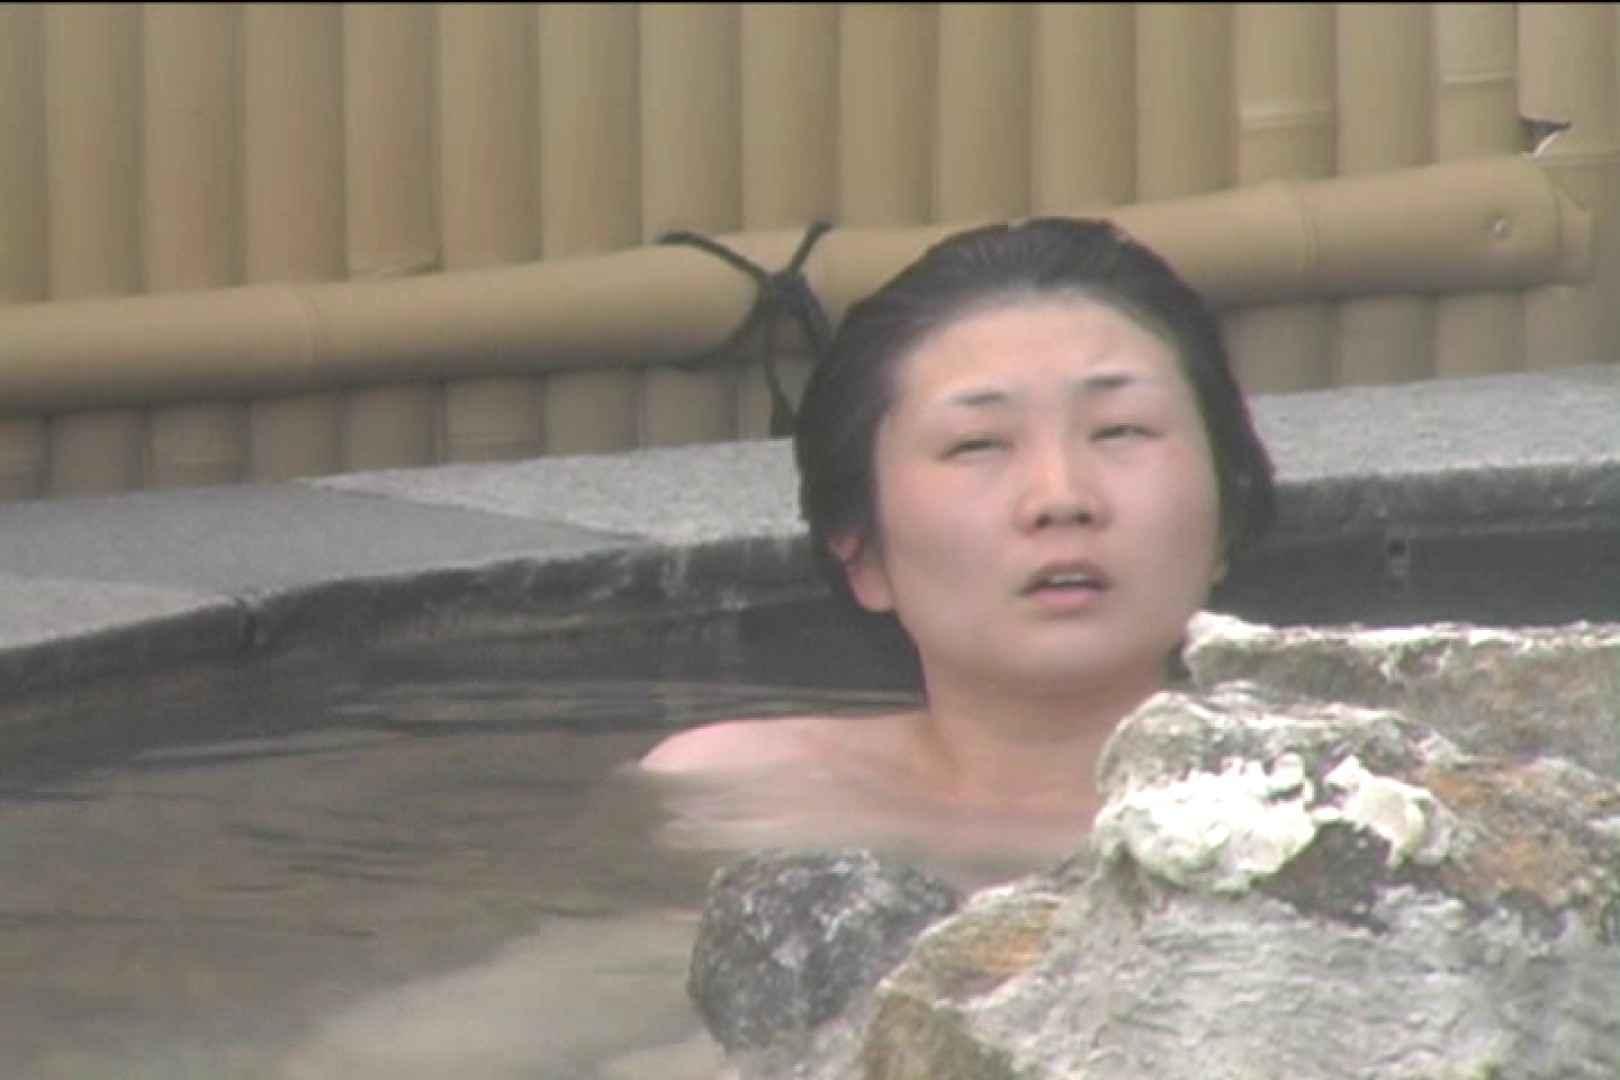 Aquaな露天風呂Vol.531 盗撮シリーズ | 露天風呂編  85PIX 55